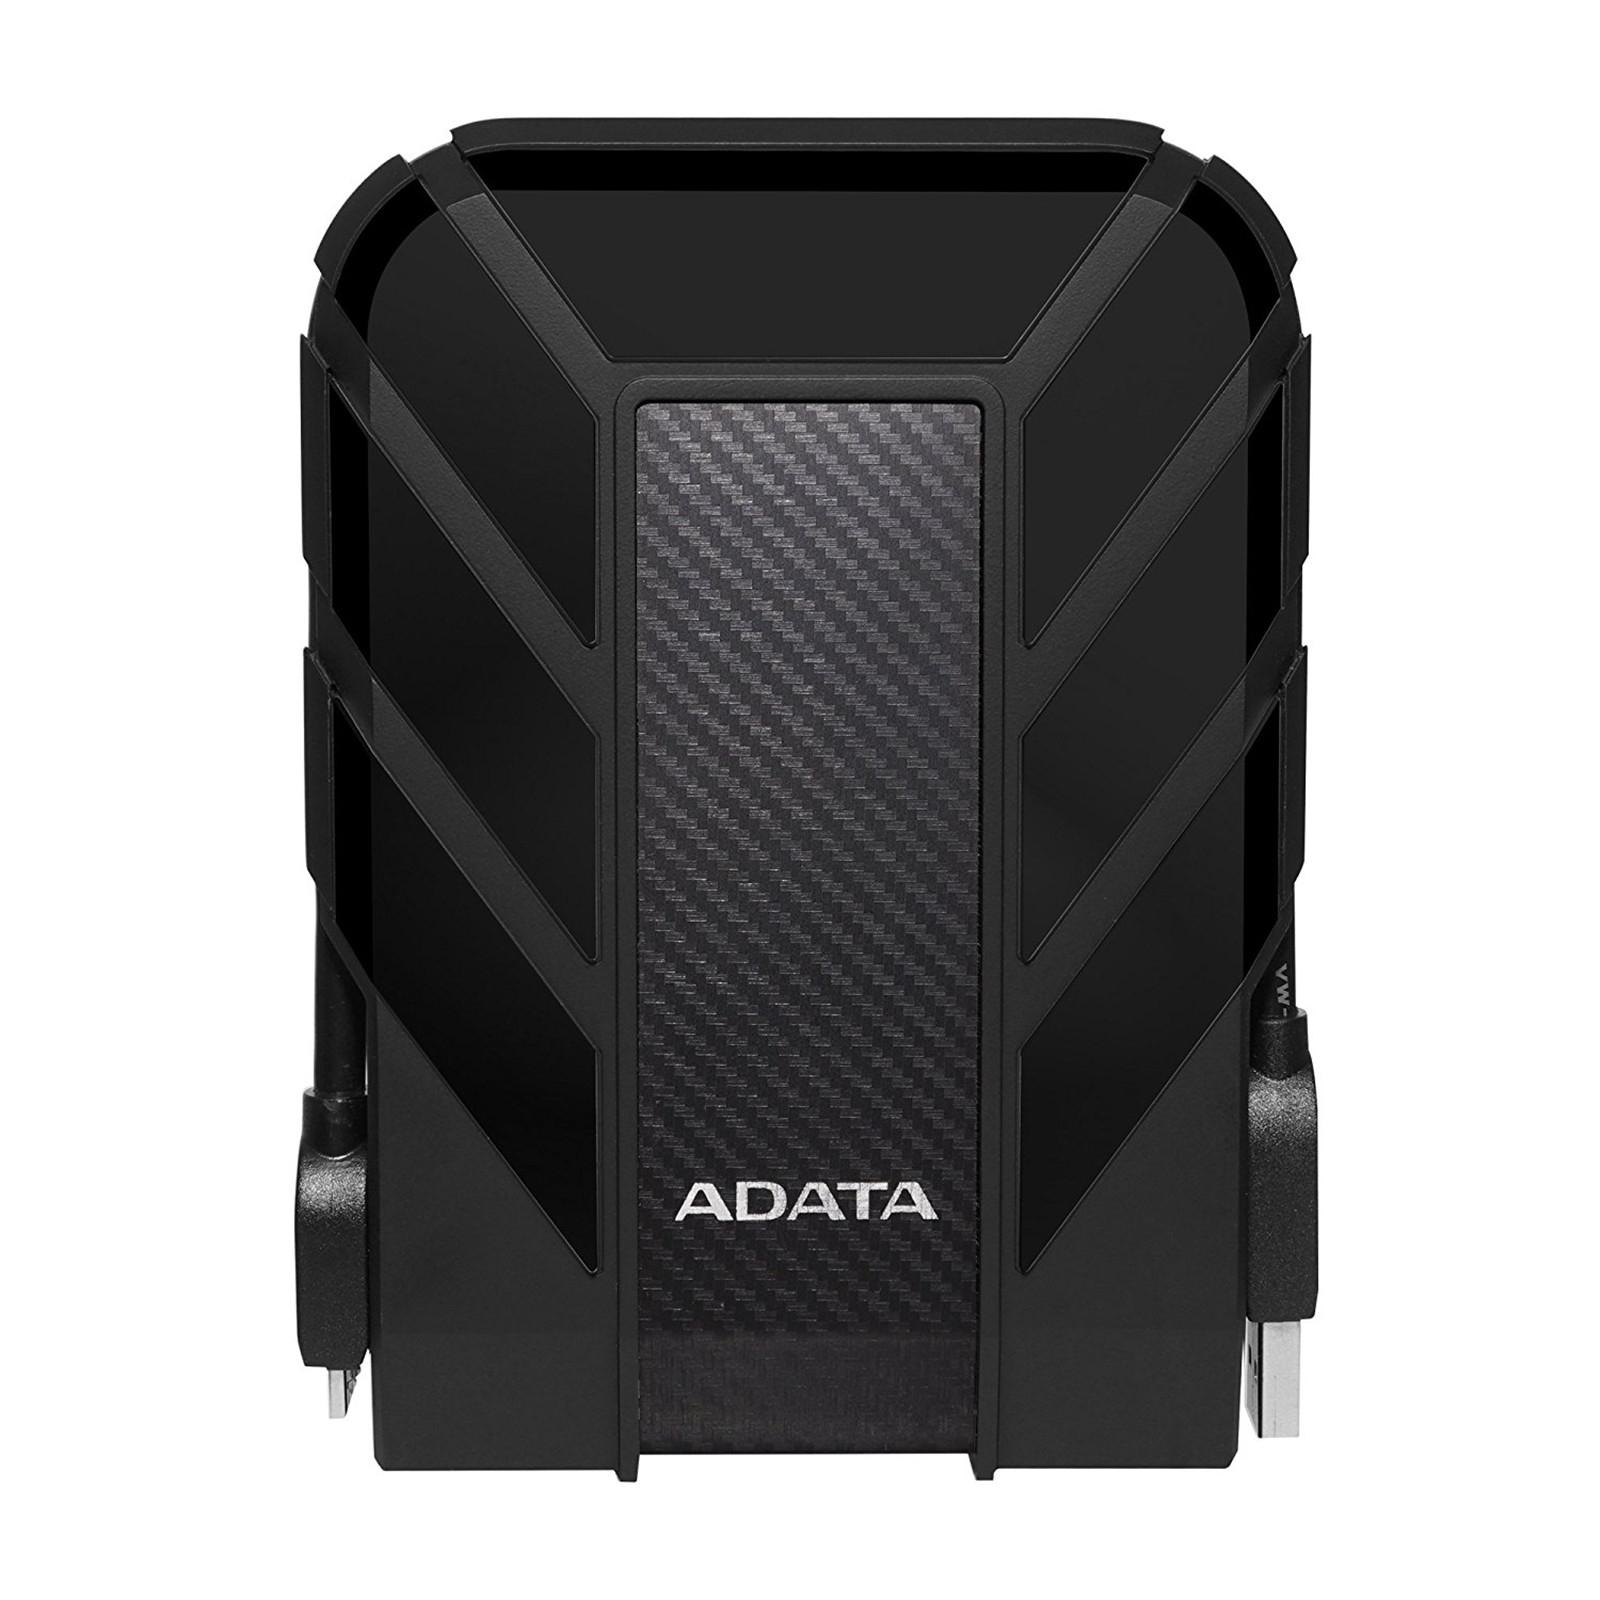 Hd710 Pro - Hard Drive - 1 TB - External (portable) - USB 3.1 - Black